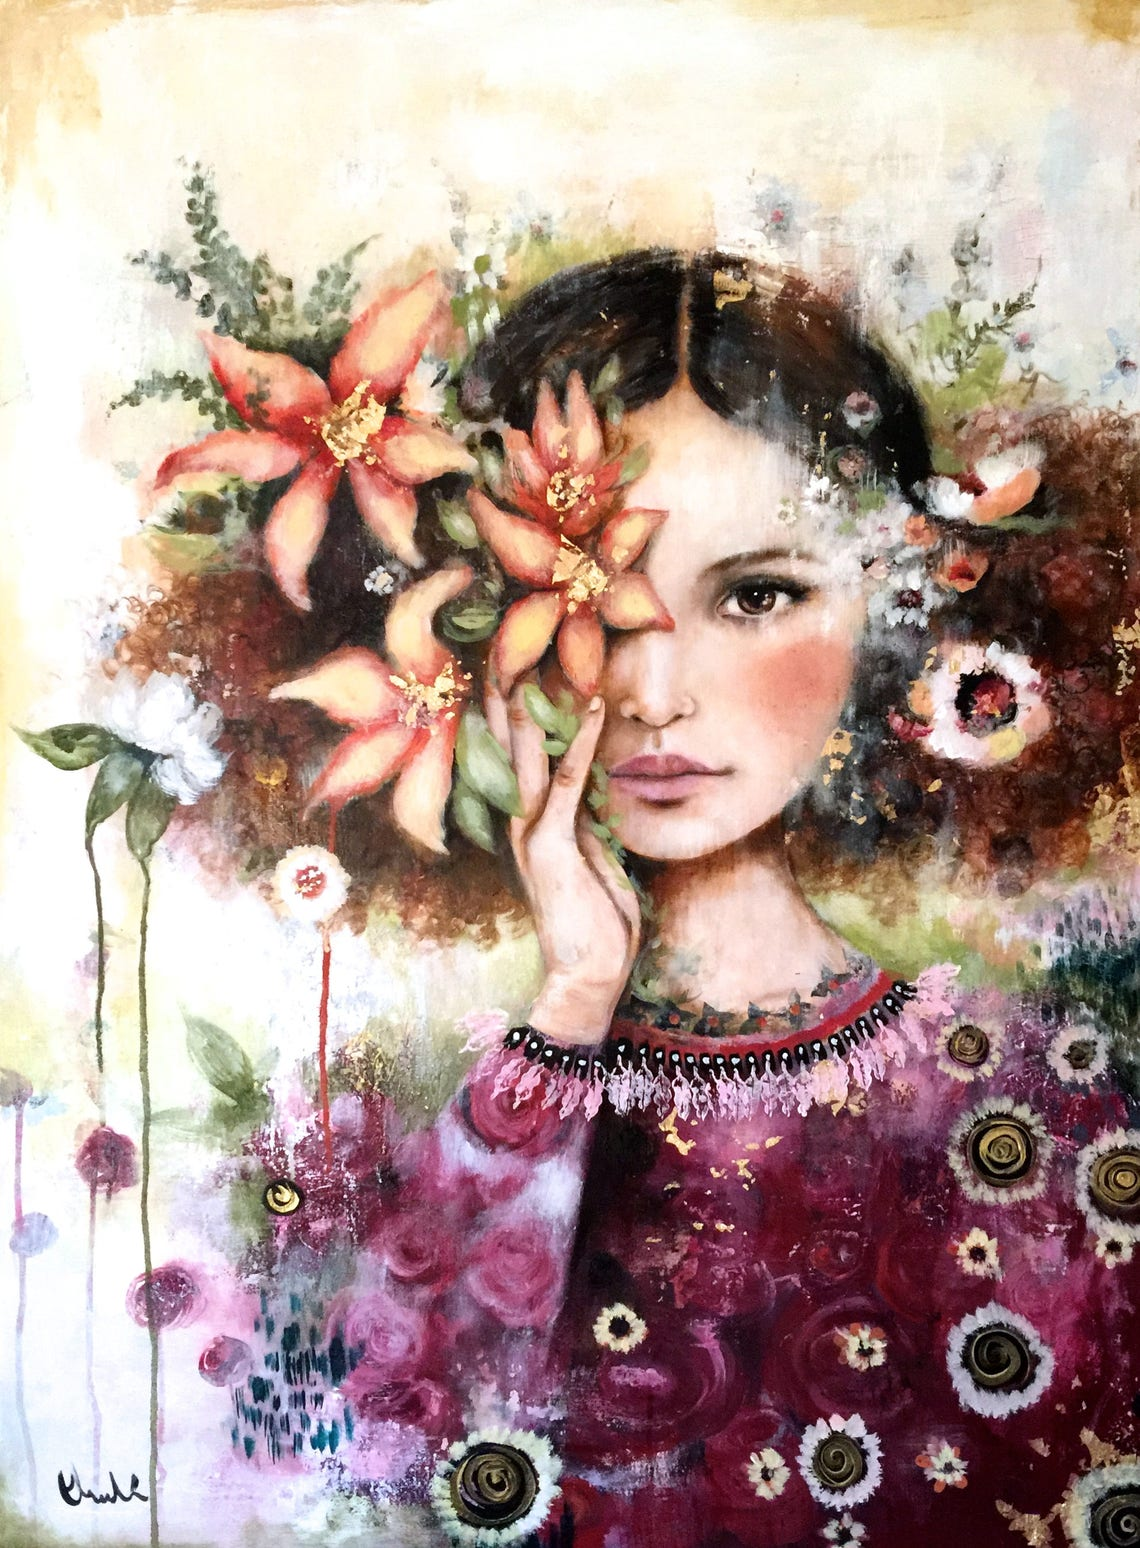 female empowermentart print drawing love portrait artwork image 0